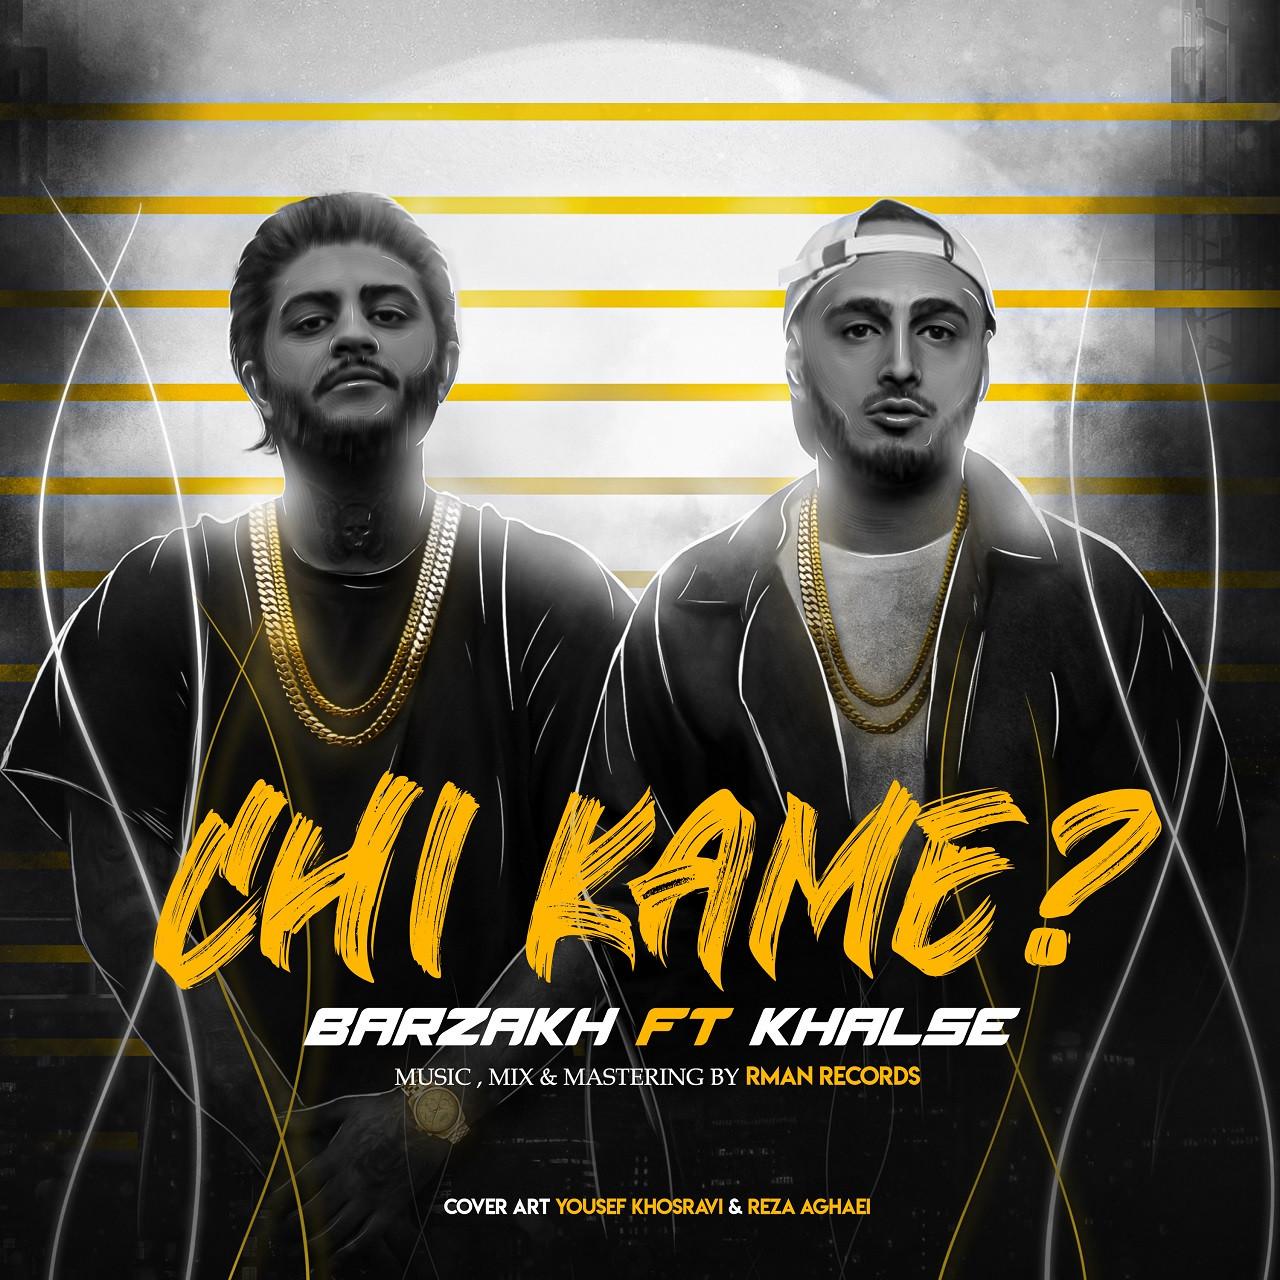 Barzakh Ft Khalse - Chi Kame